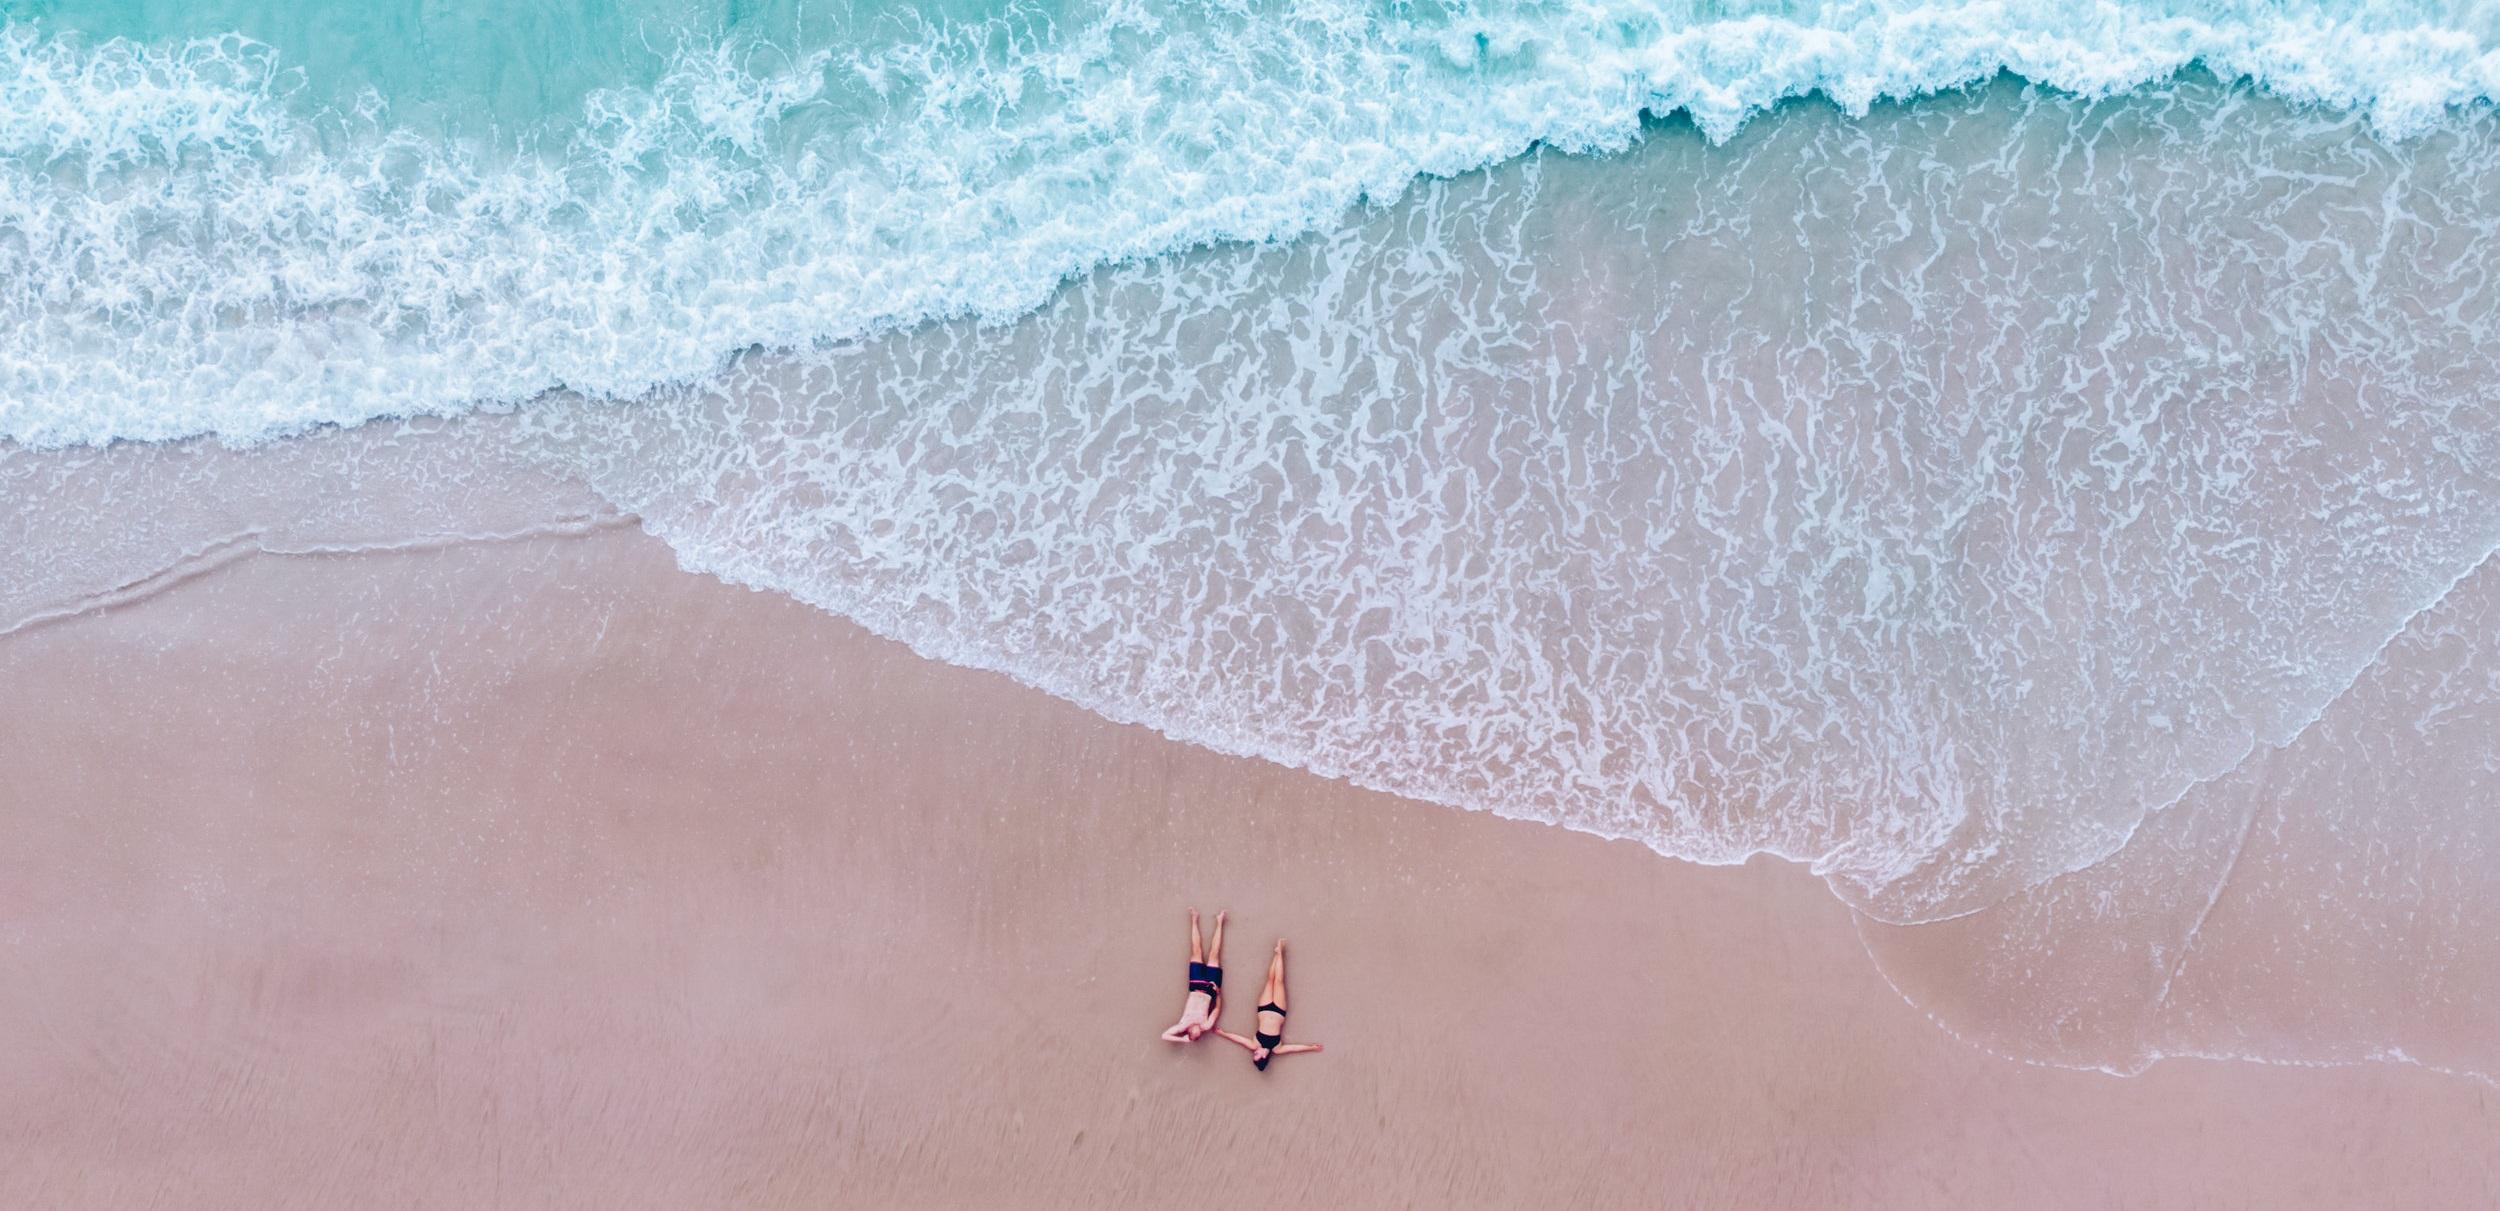 Craving Adventure - New Zealand - Travel - Adventure - Couple - Beach - Ocean - Drone - Blog